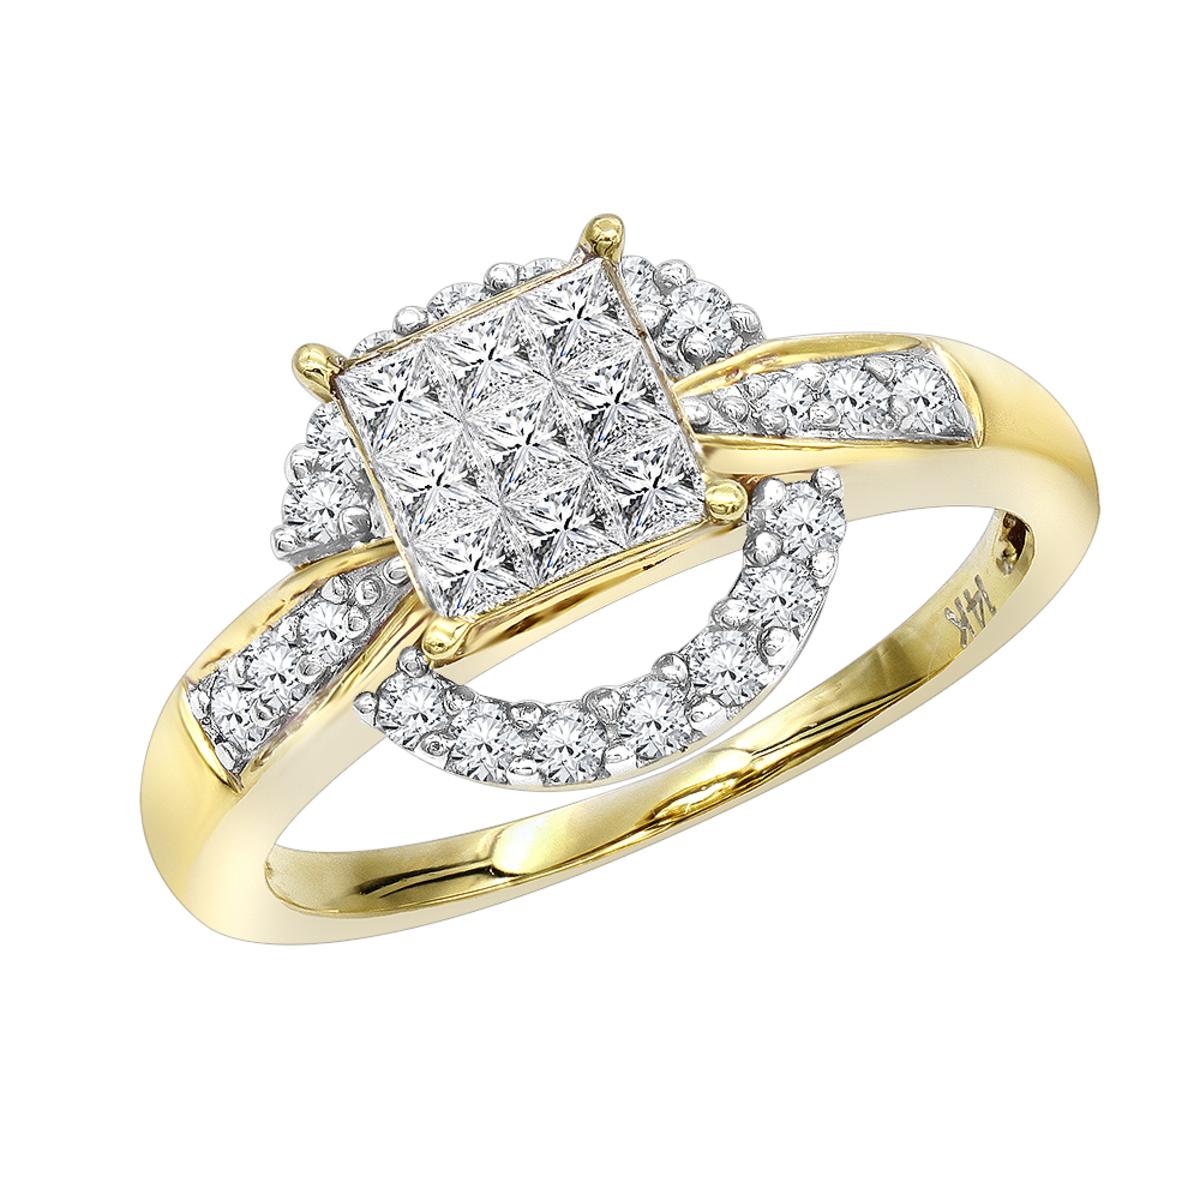 14K Gold Pre-set Diamond Engagement Ring 0.8 ct